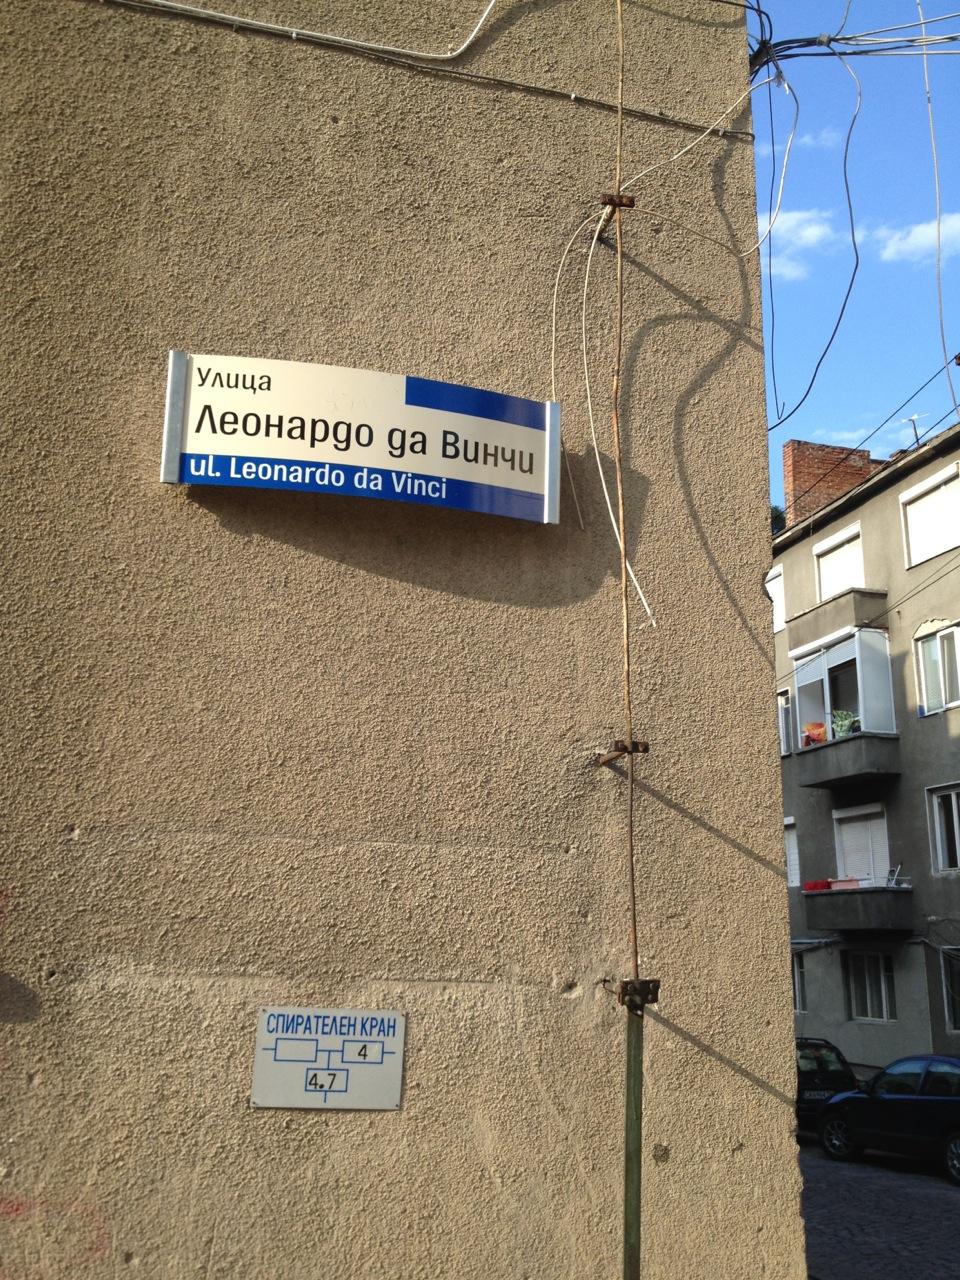 Leonardo da Vinci Street